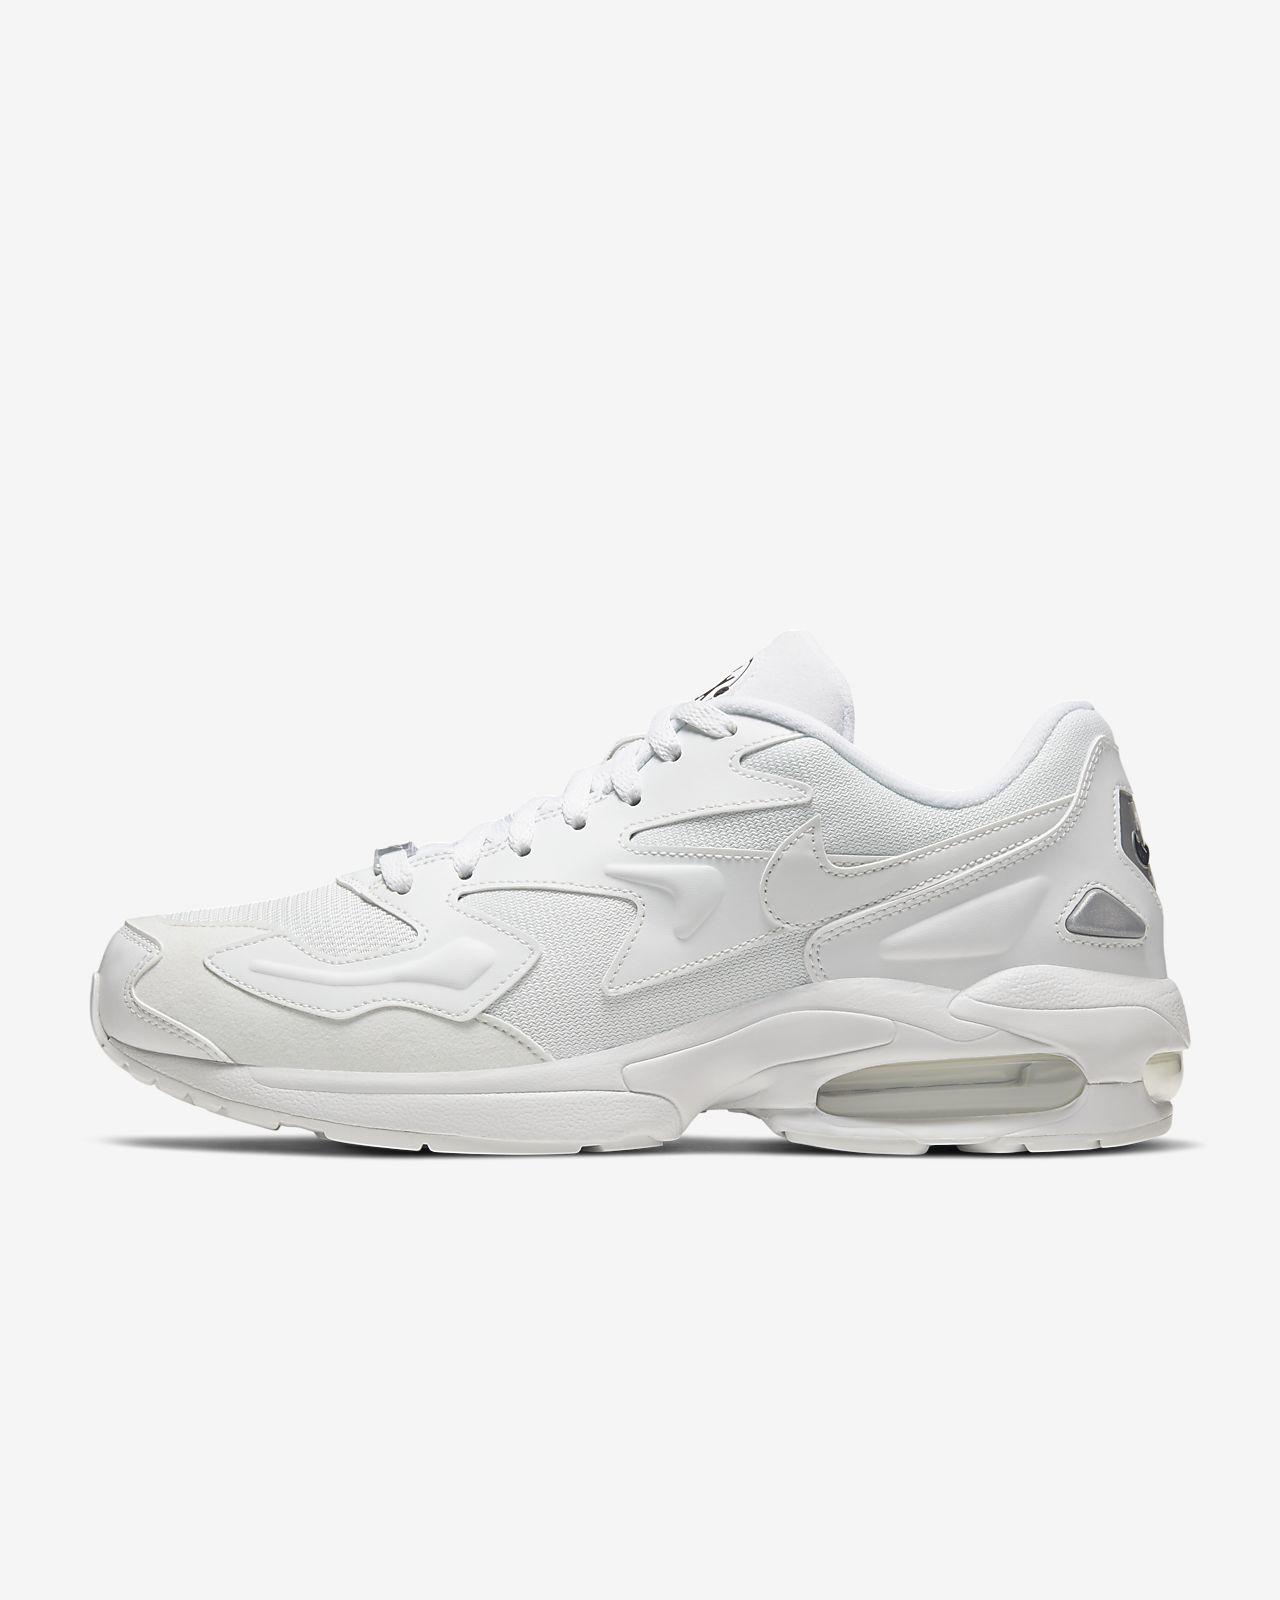 d070b85d3a Nike Air Max2 Light Men's Shoe. Nike.com GB